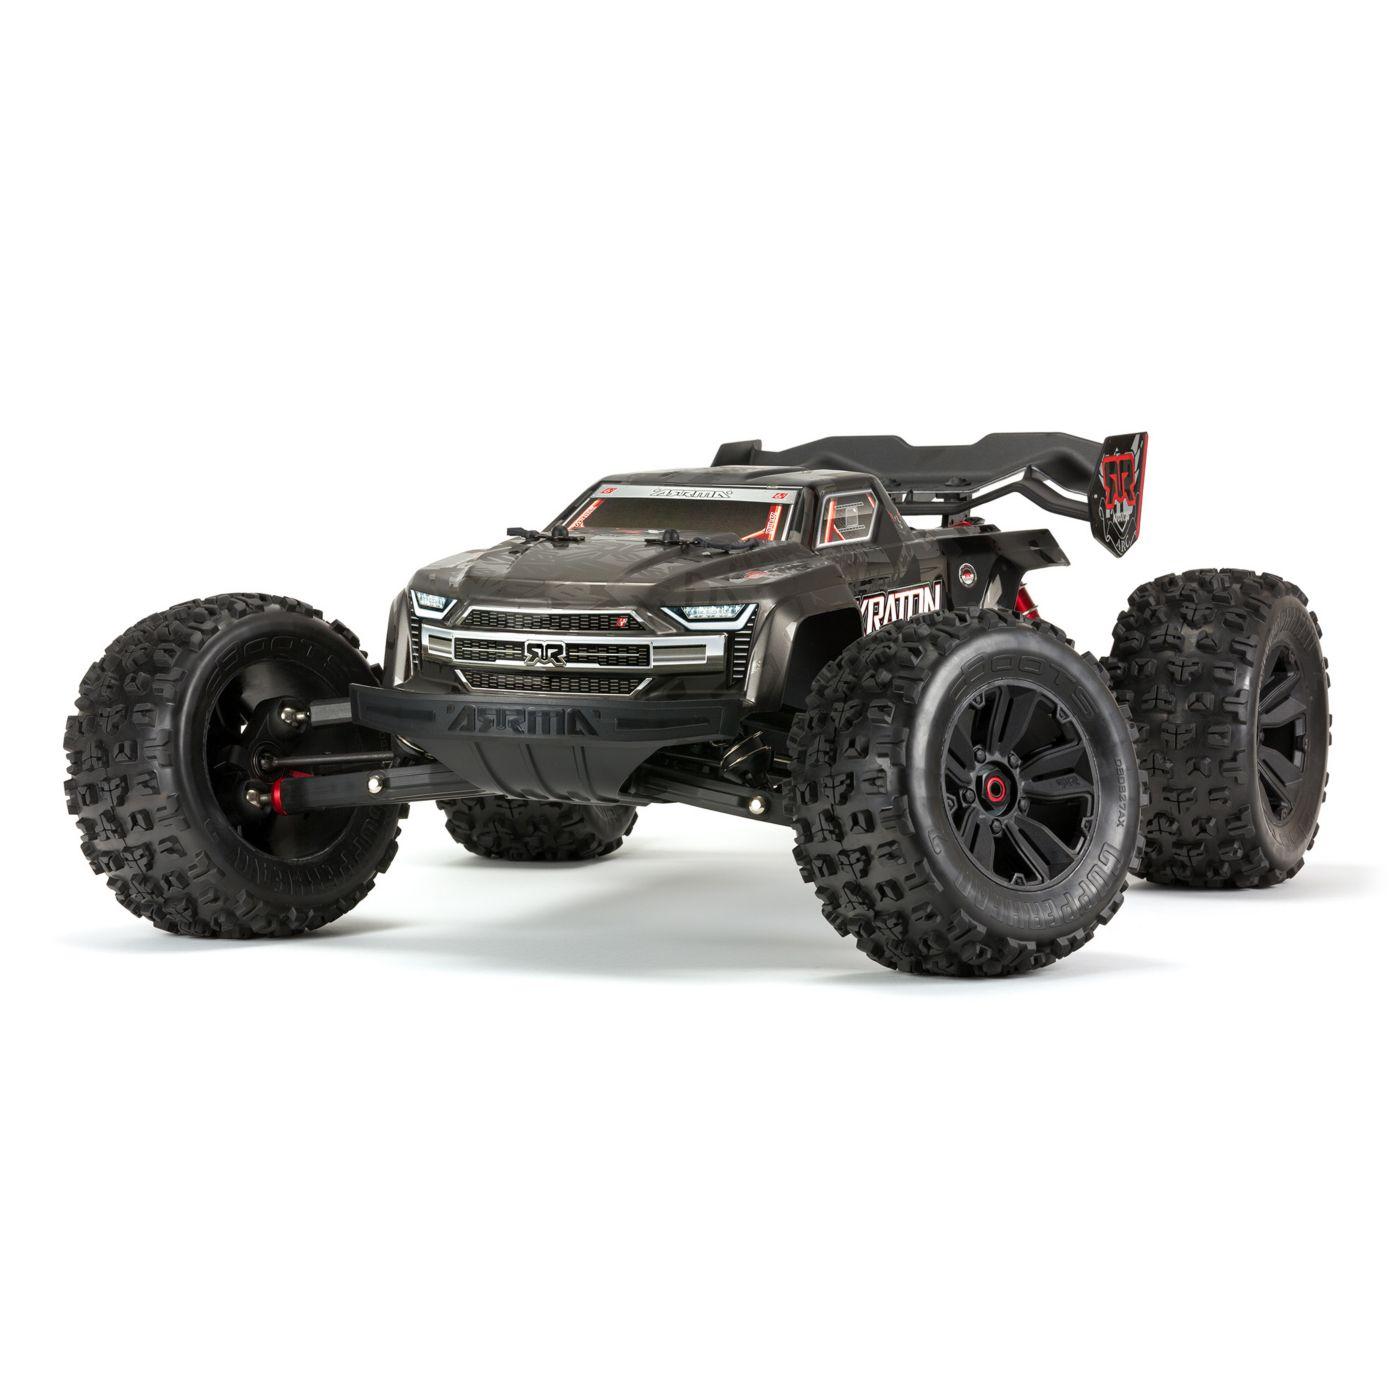 ARRMA's Kraton EXB Extreme Bash Roller 1/8-scale Monster Truck